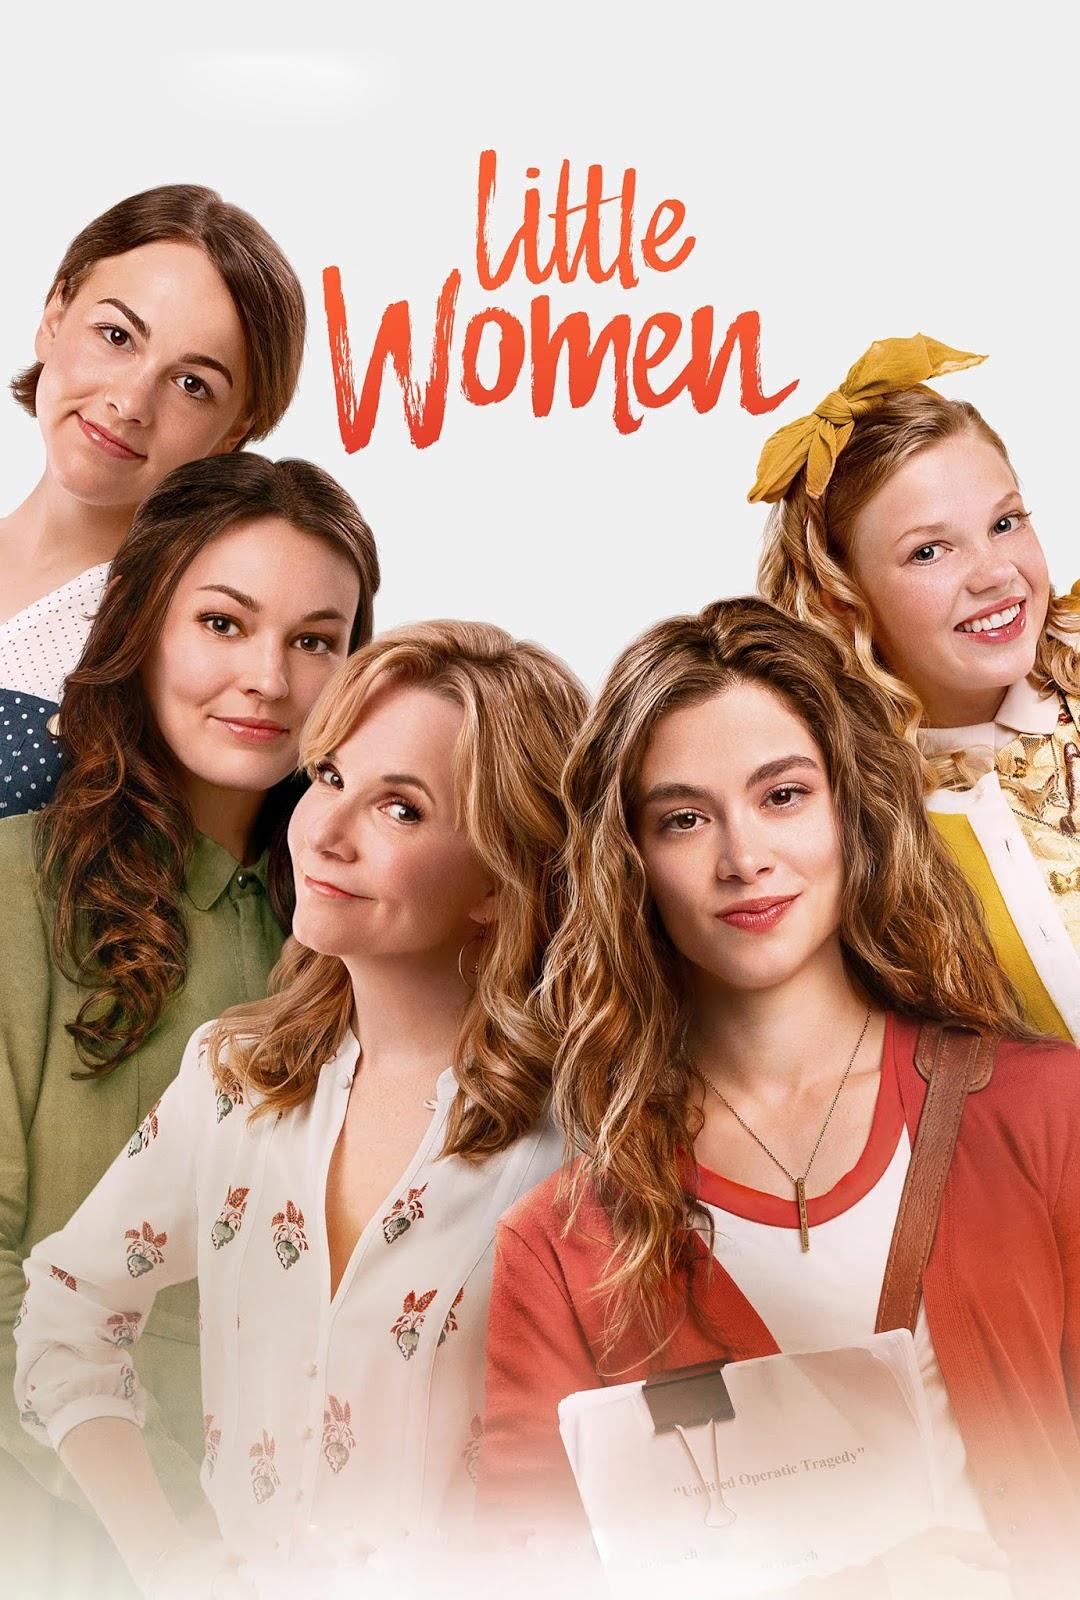 Little Women [2018] [DVDR] [NTSC] [Latino] [V2]